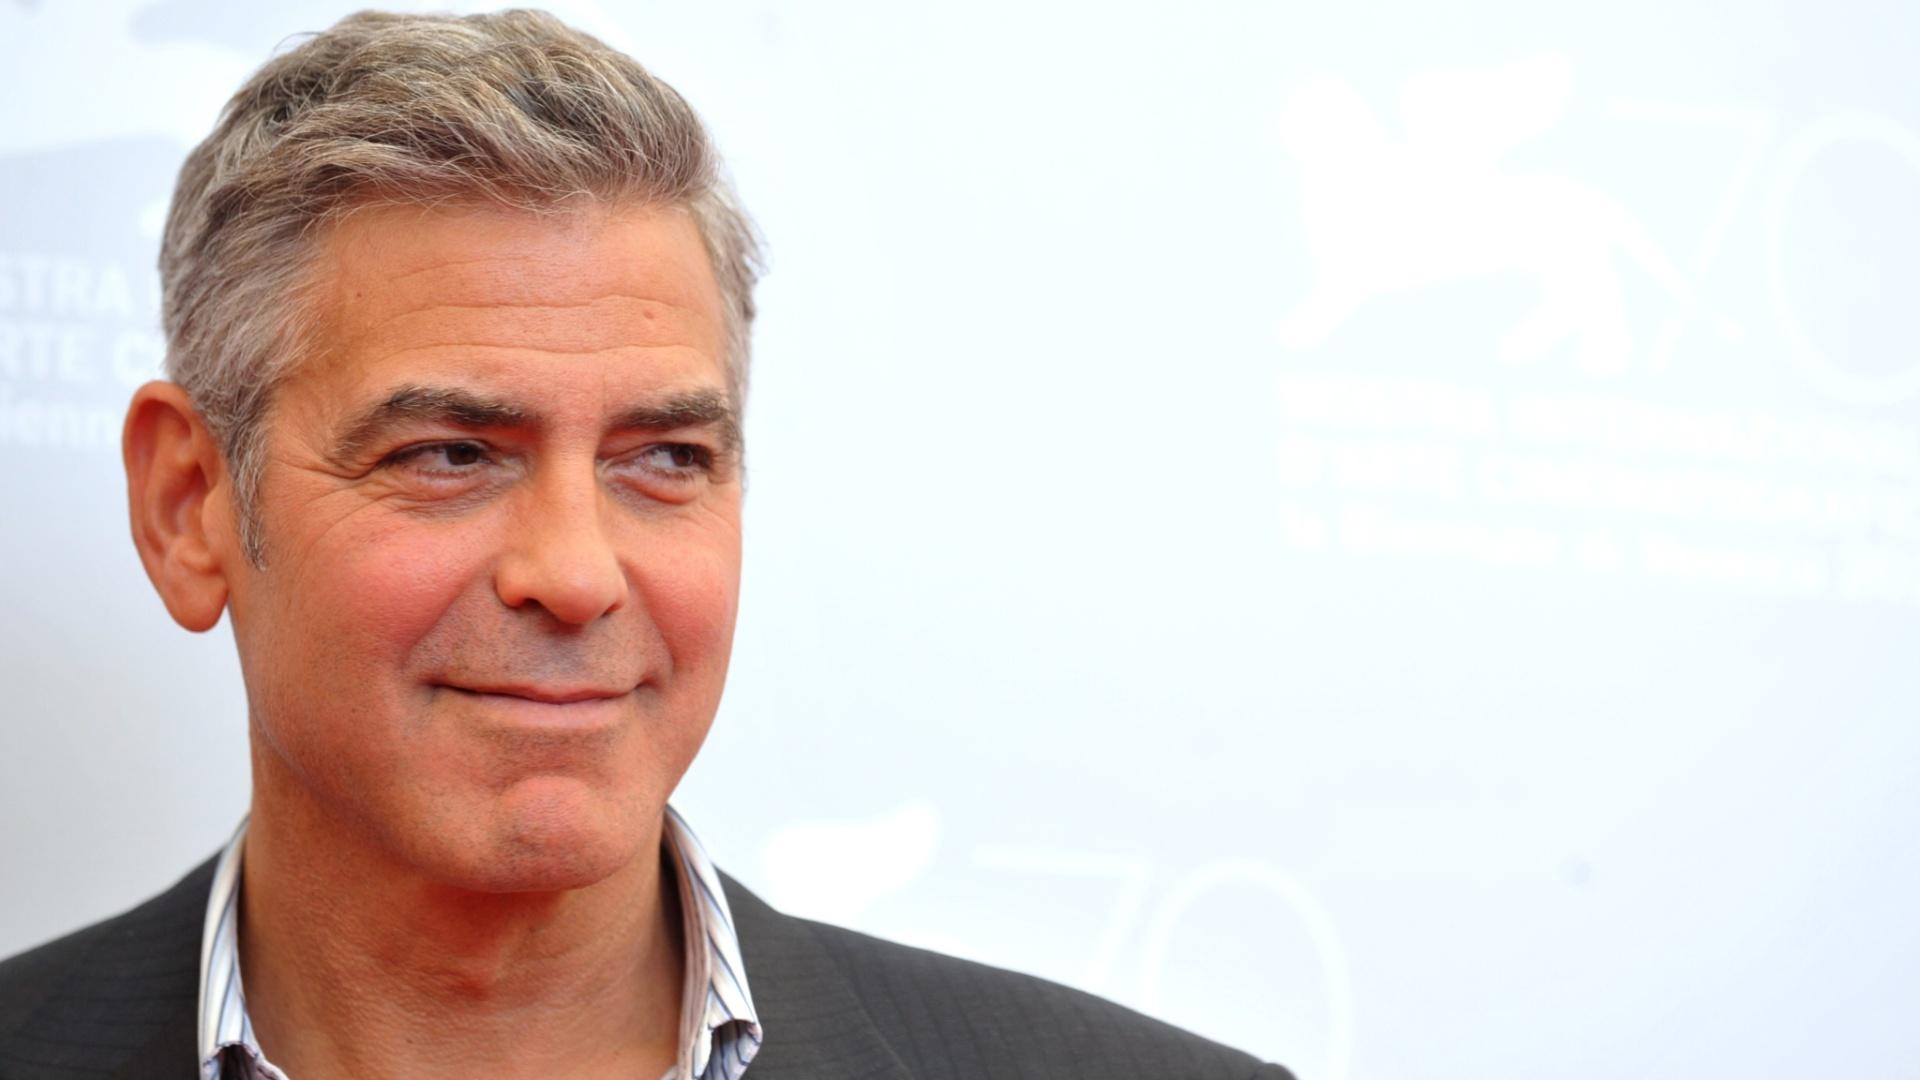 George Clooney wallpaper 1920x1080 62577 1920x1080